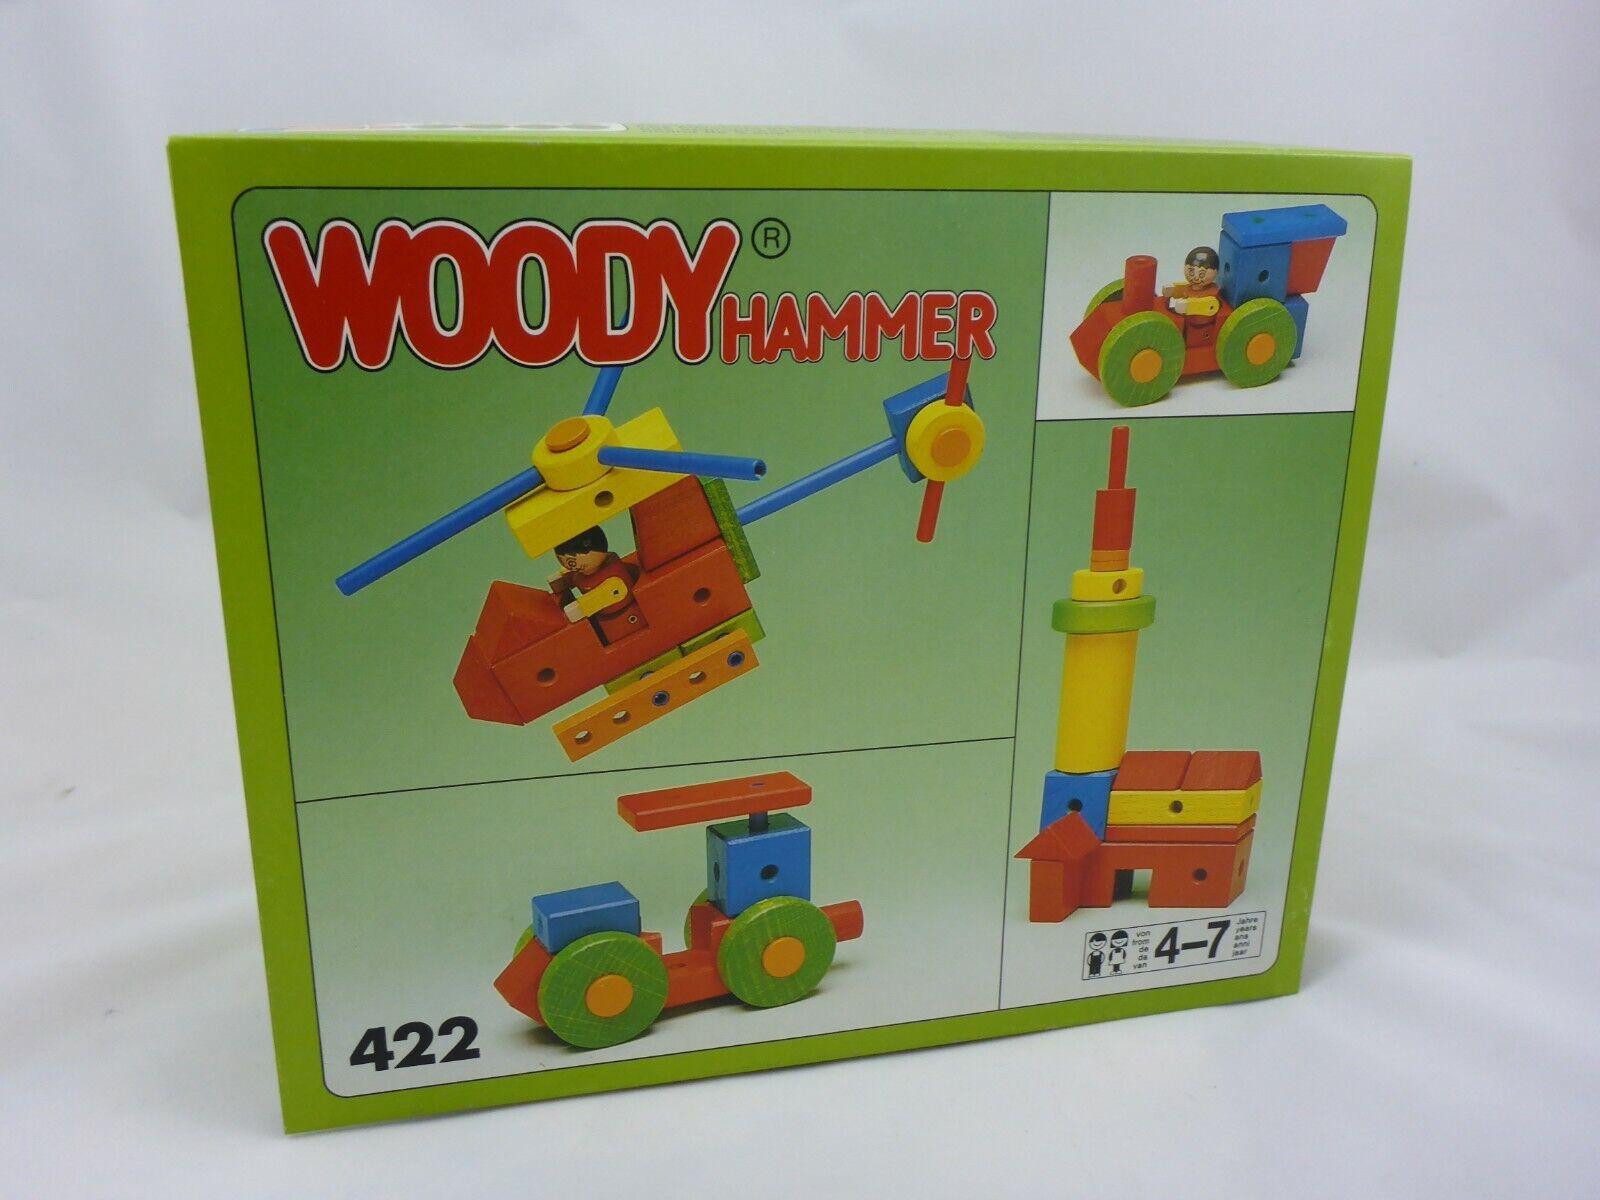 Matador Woody Hammer 422 Holzbaukasten - Retro - ab 4-7 Jahre